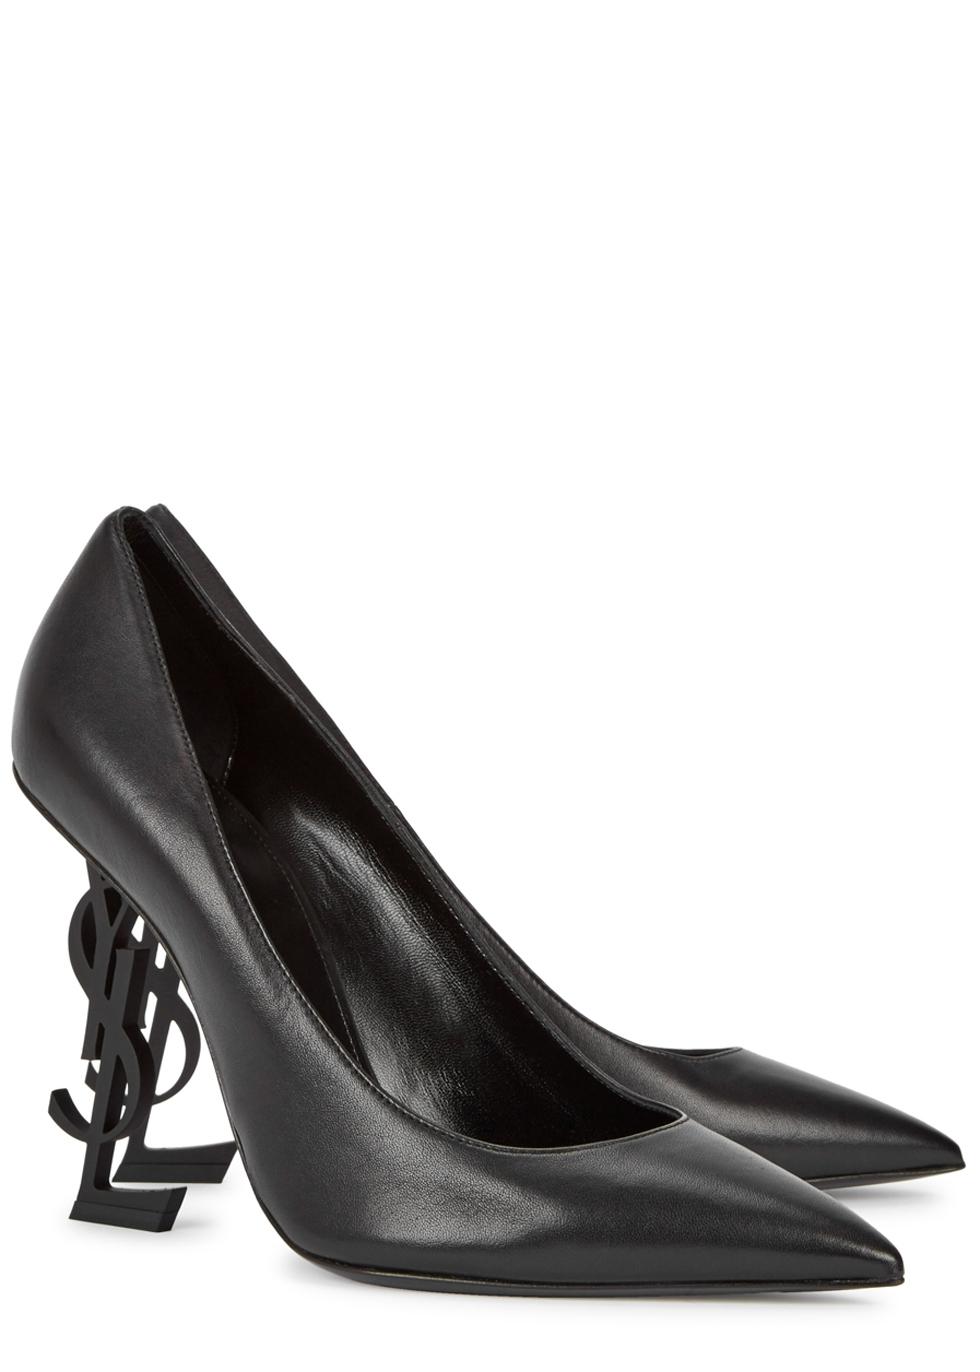 da5be610692 Women s Designer High-Heel Pumps - Harvey Nichols